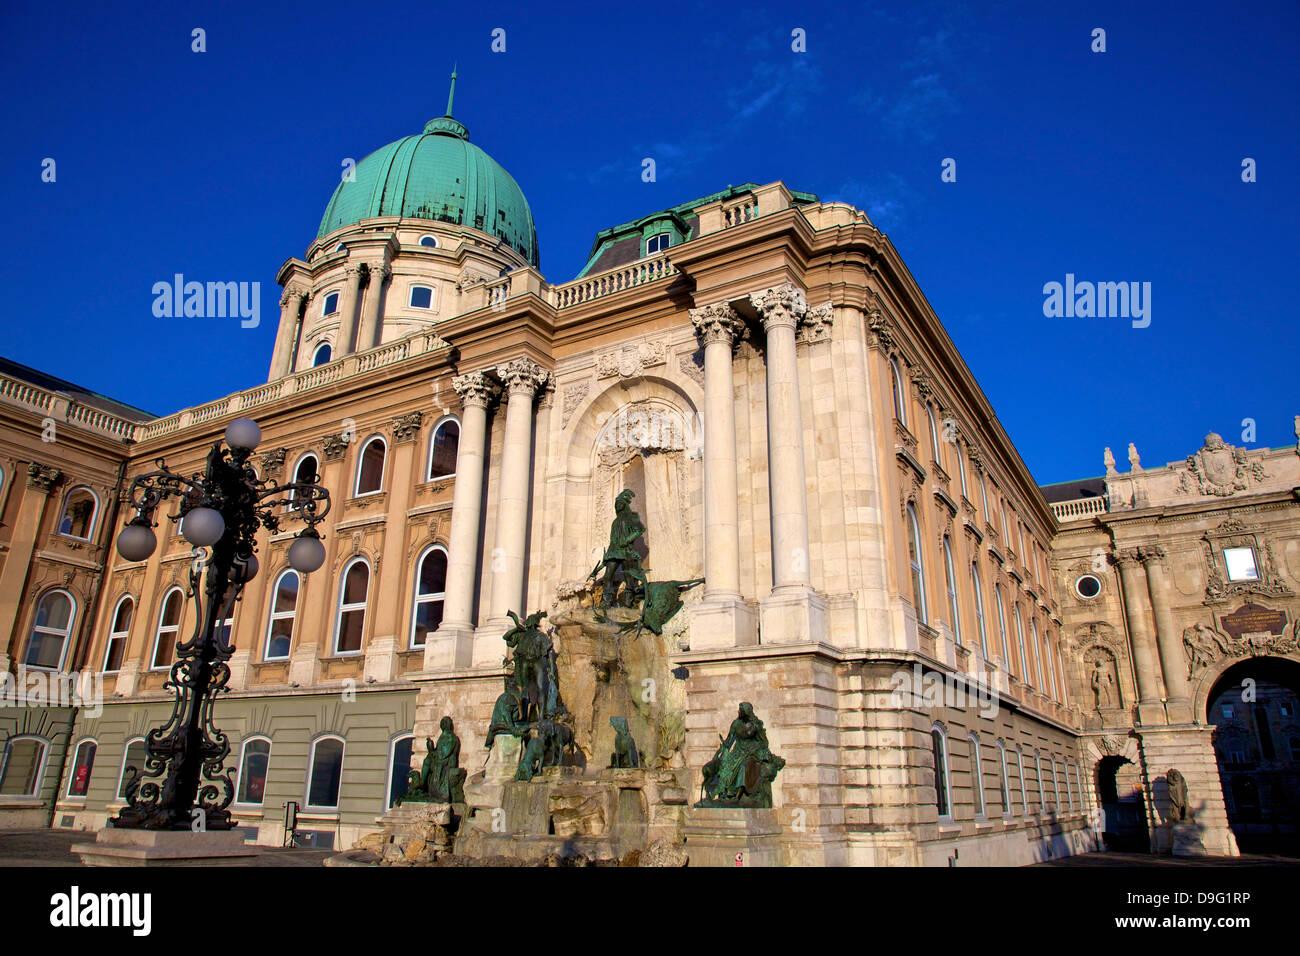 Matthias Fountain, Buda Castle, UNESCO World Heritage Site, Budapest, Hungary - Stock Image